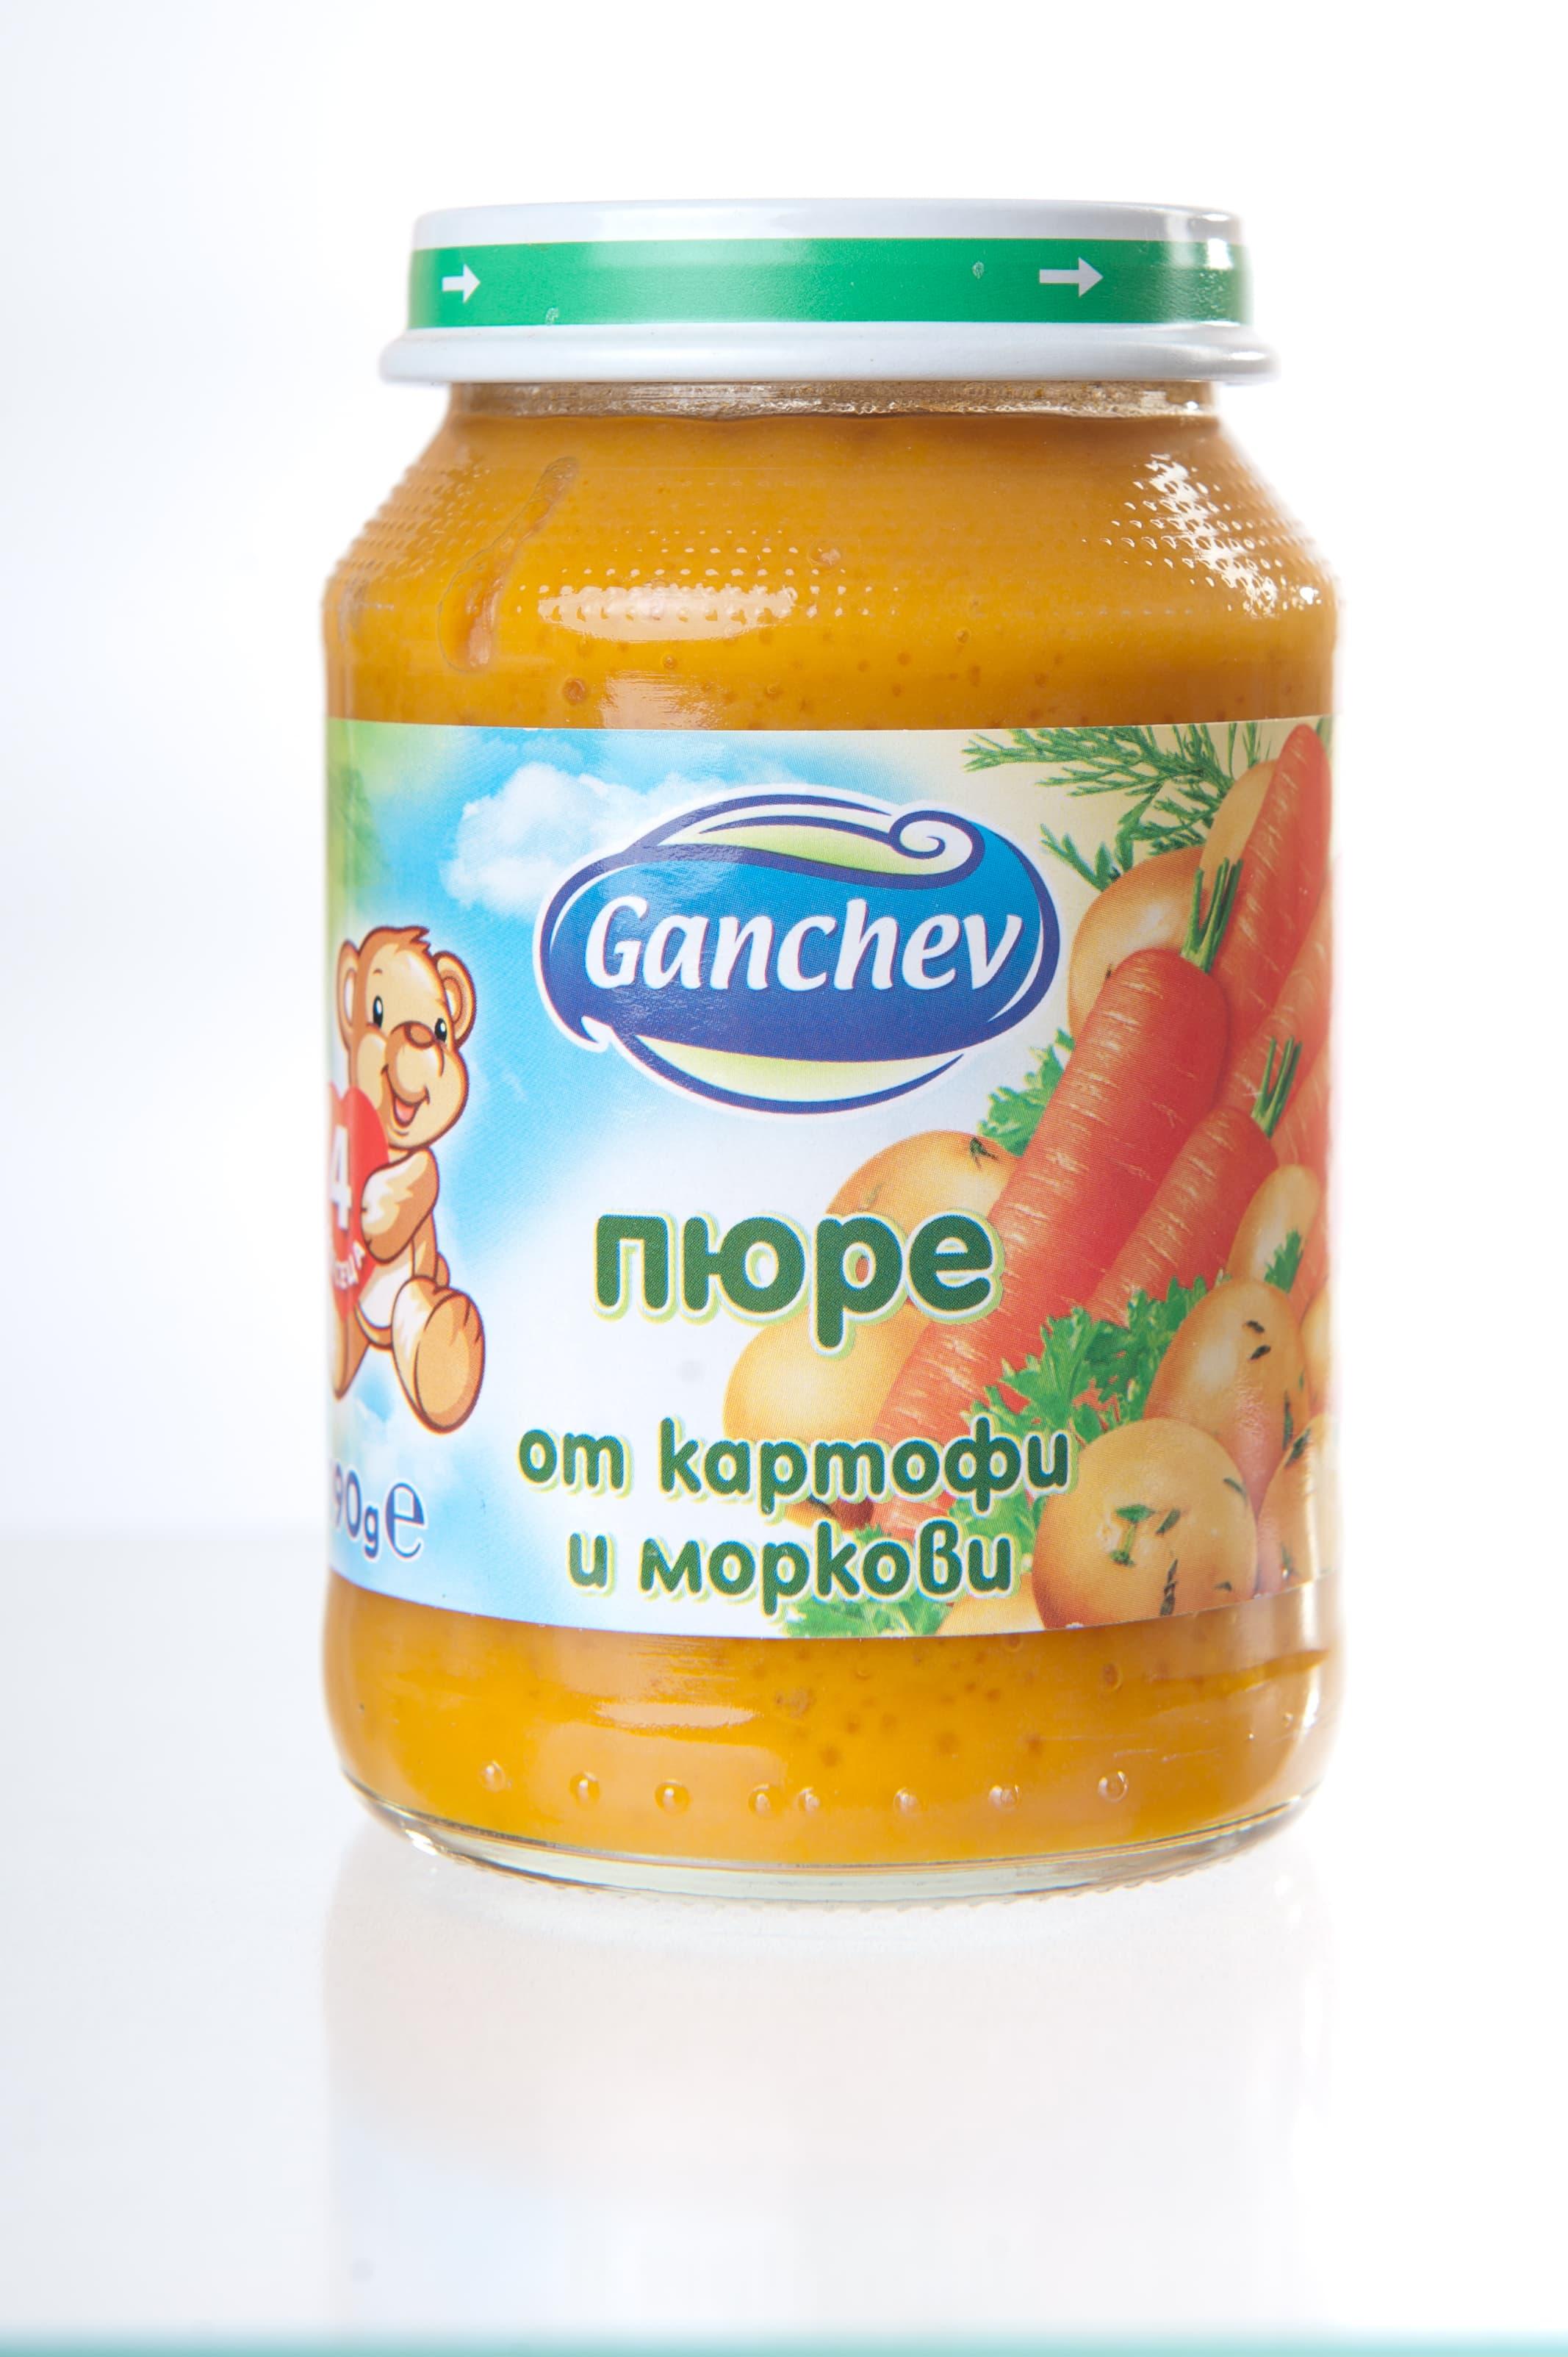 Ganchev-пюре картофи и моркови 4м+ 190гр